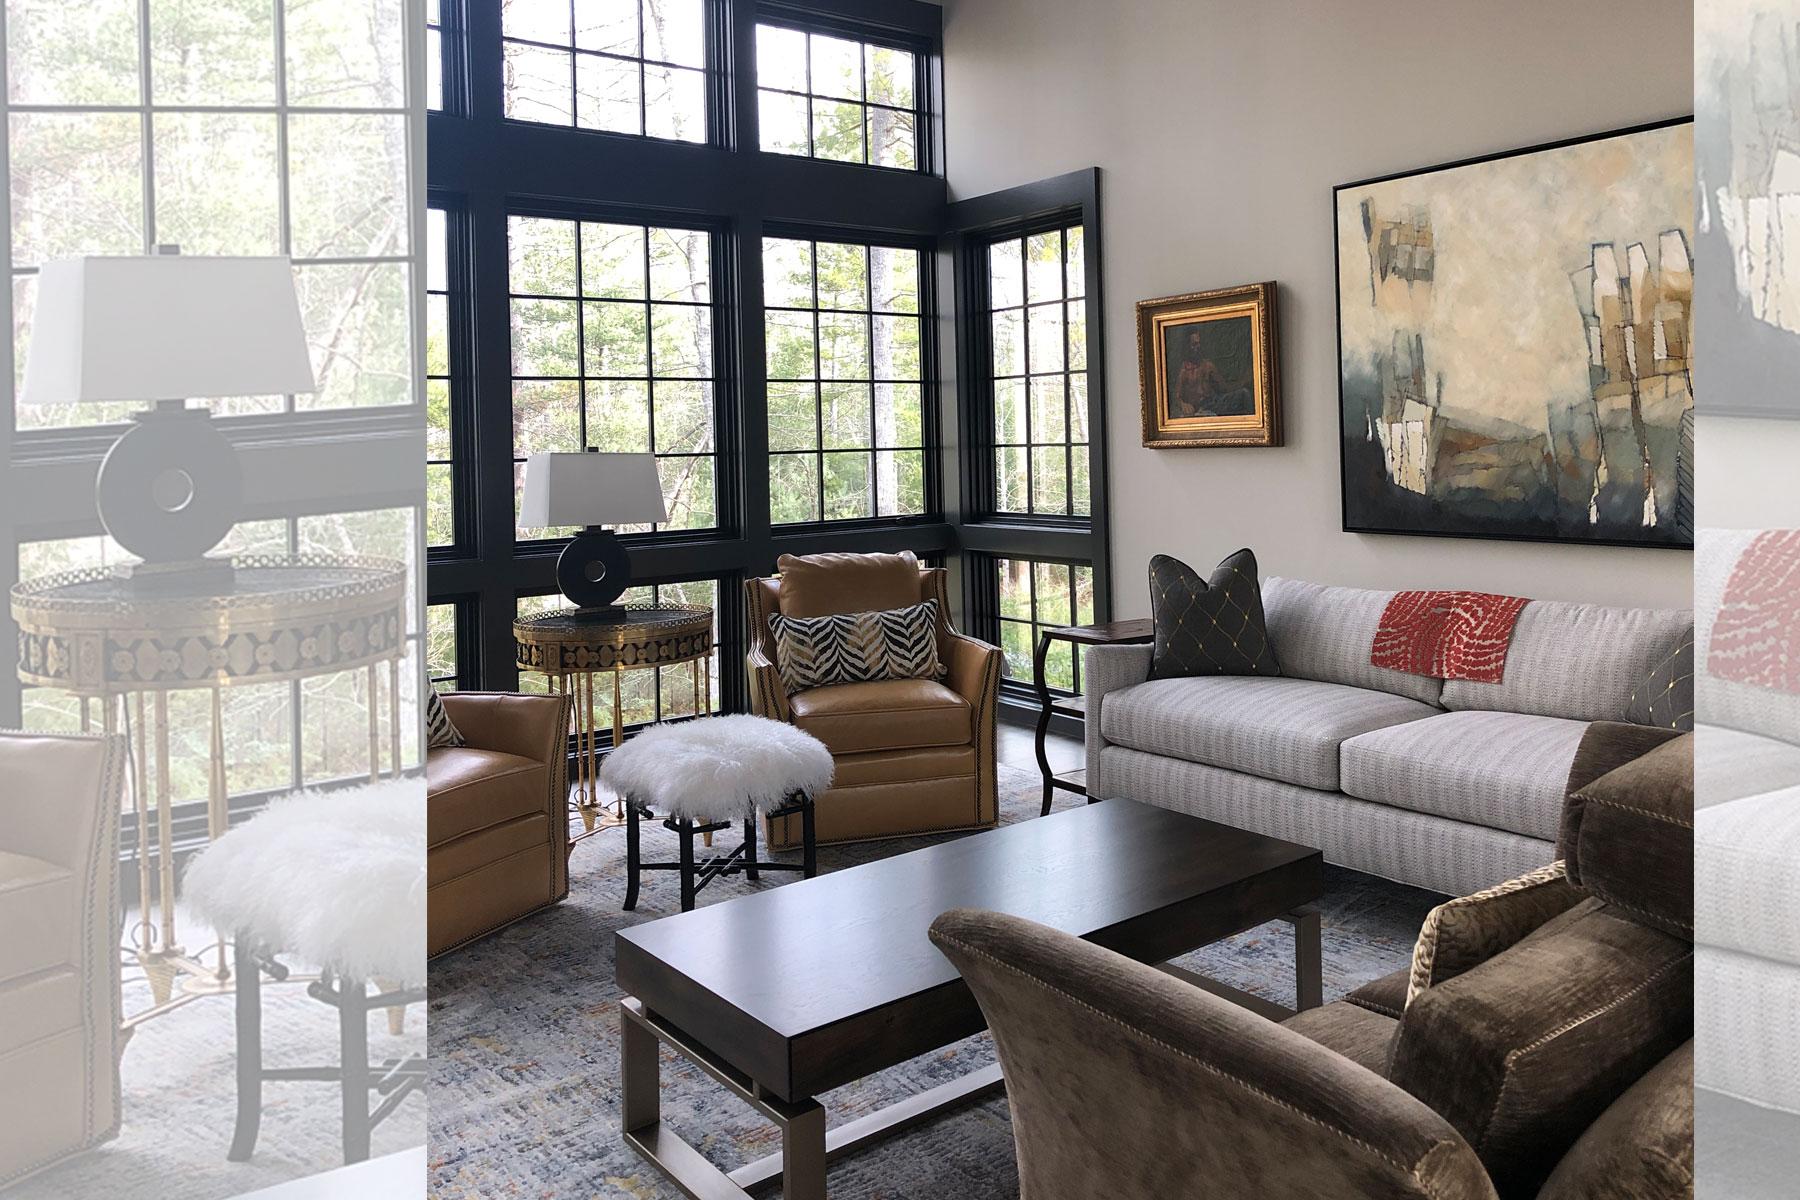 wall-of-windows-bright-modern-living-room